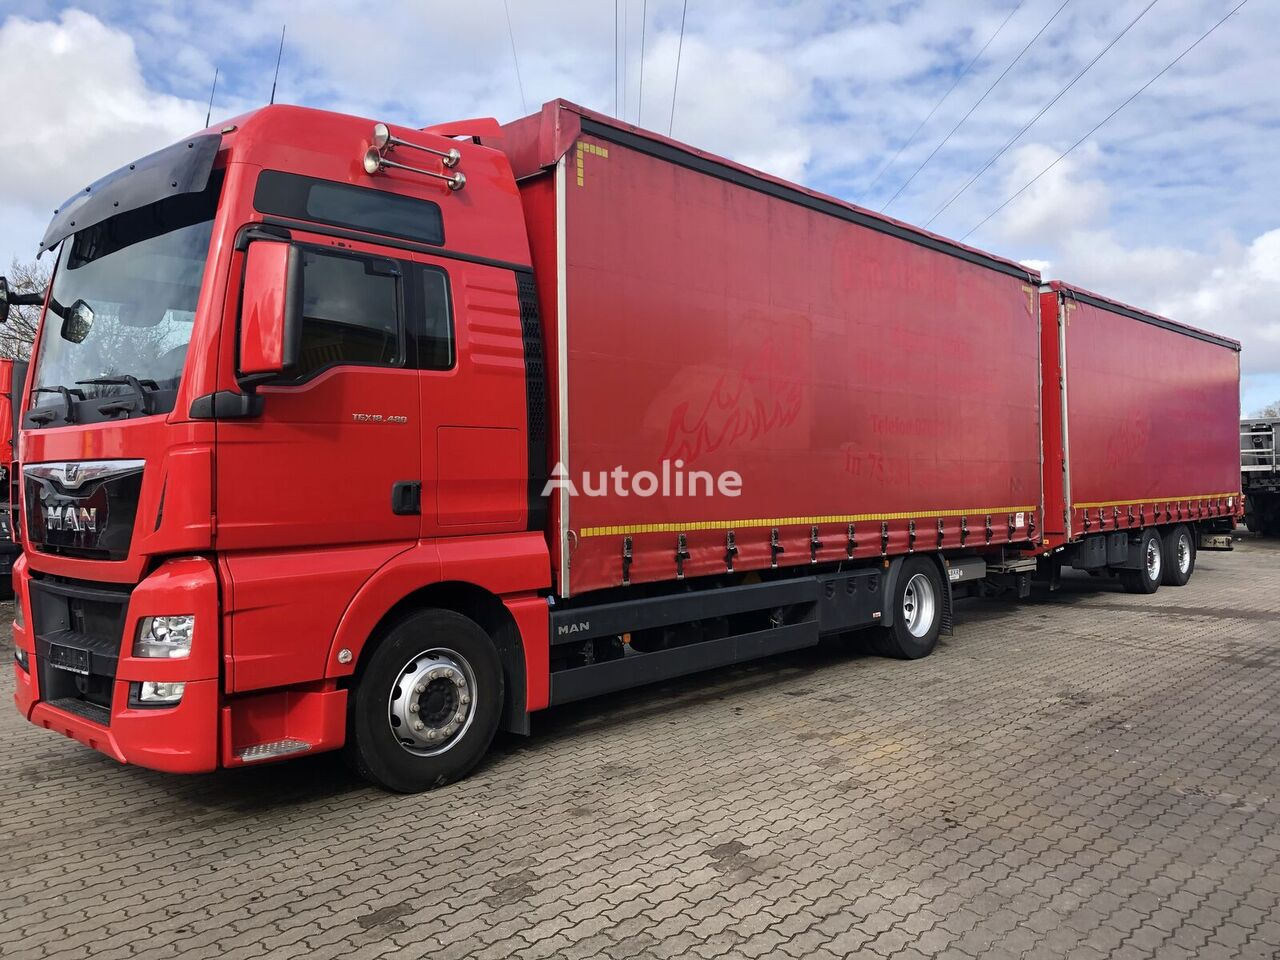 грузовик штора MAN TGX 18.480 XXL Euro 6 kompletter Zug/with Trailer Durchlader + прицеп штора